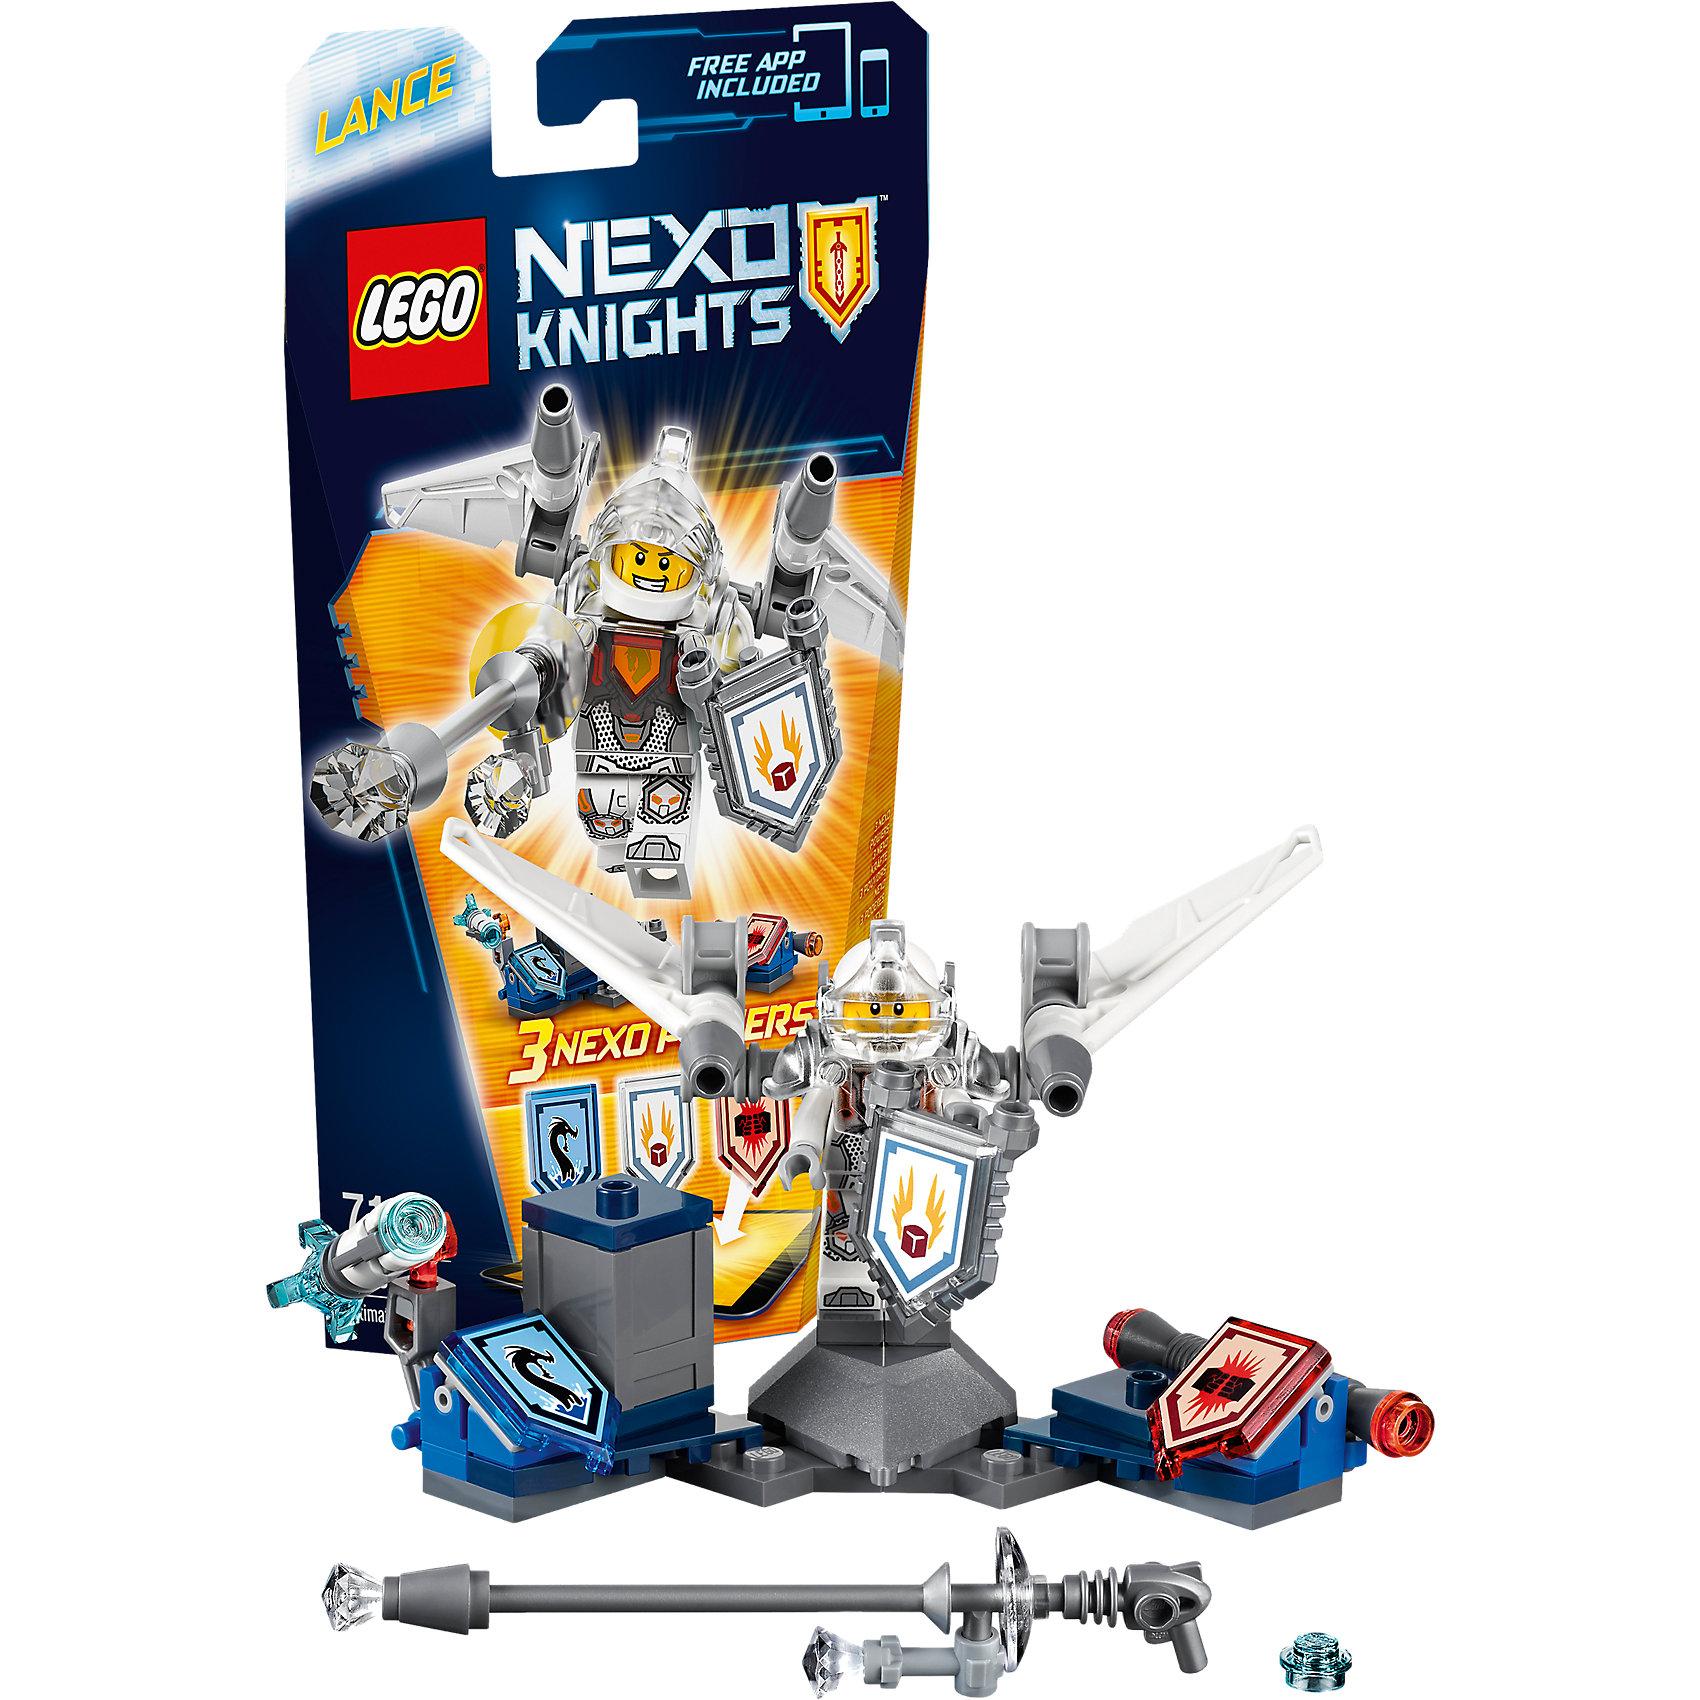 LEGO LEGO NEXO KNIGHTS 70337: Ланс - Абсолютная сила lego lego nexo knights 70334 предводитель монстров – абсолютная сила